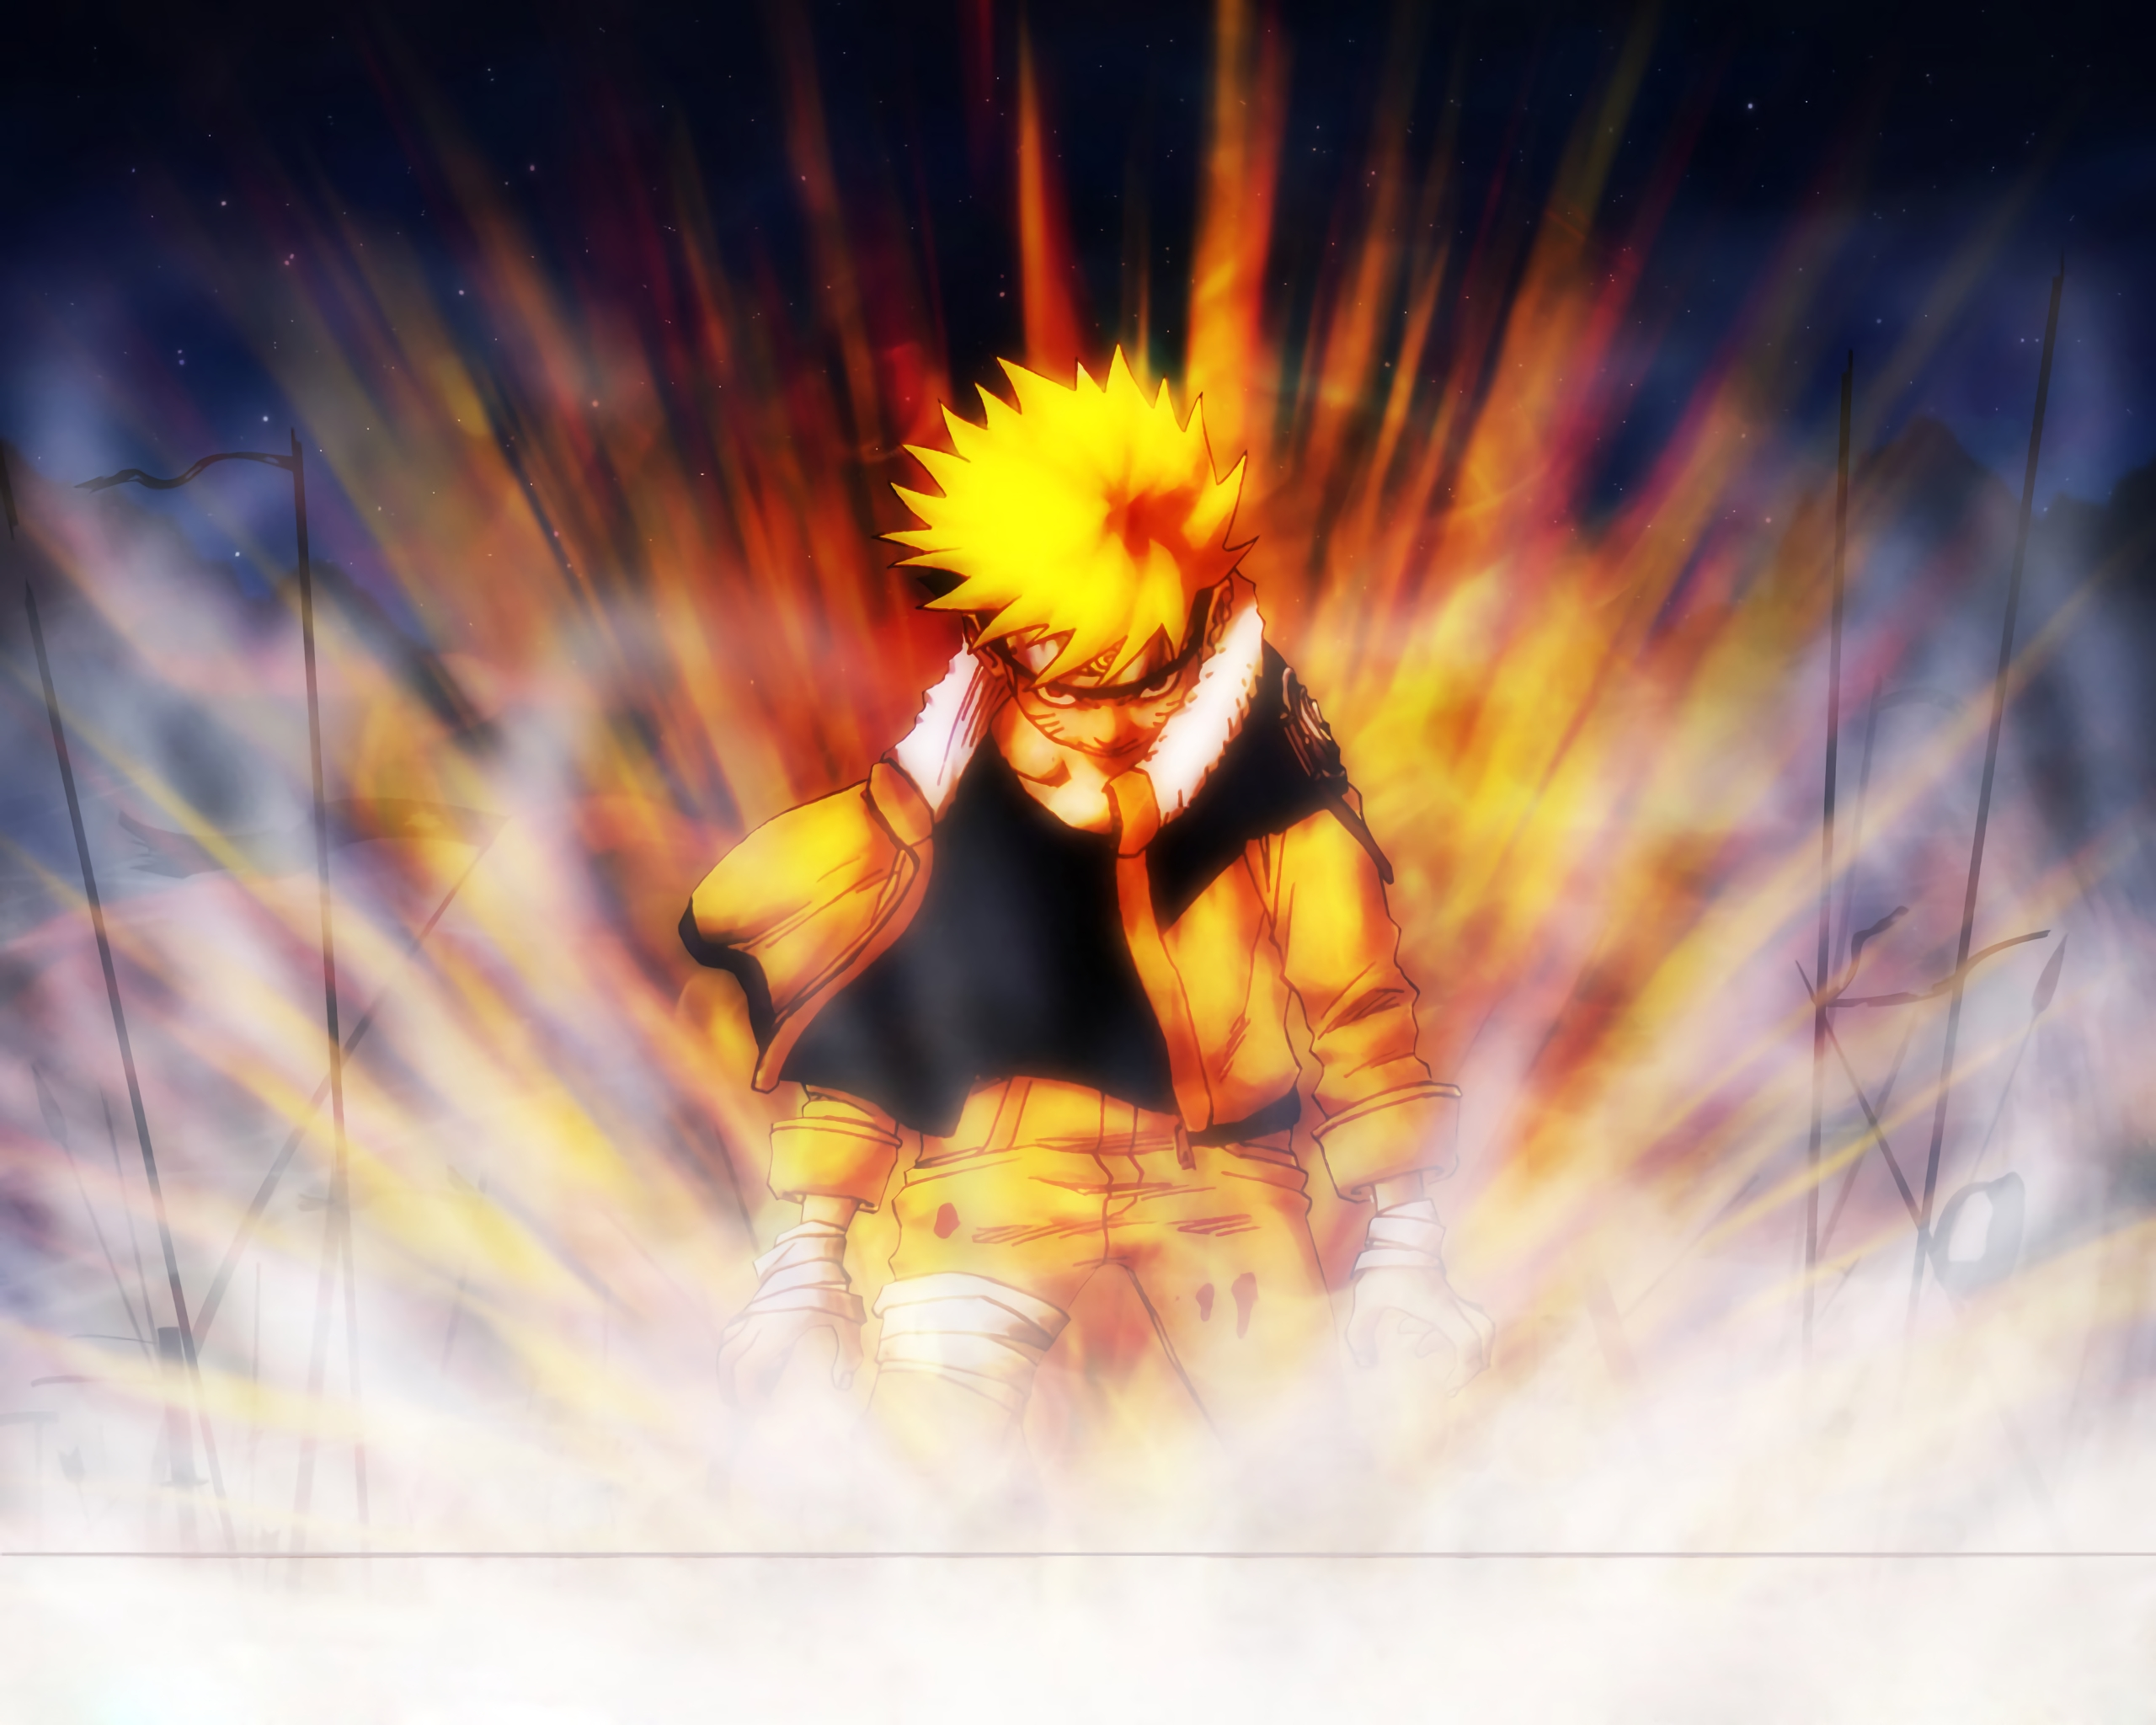 Fondos de pantalla Naruto Uzumaki